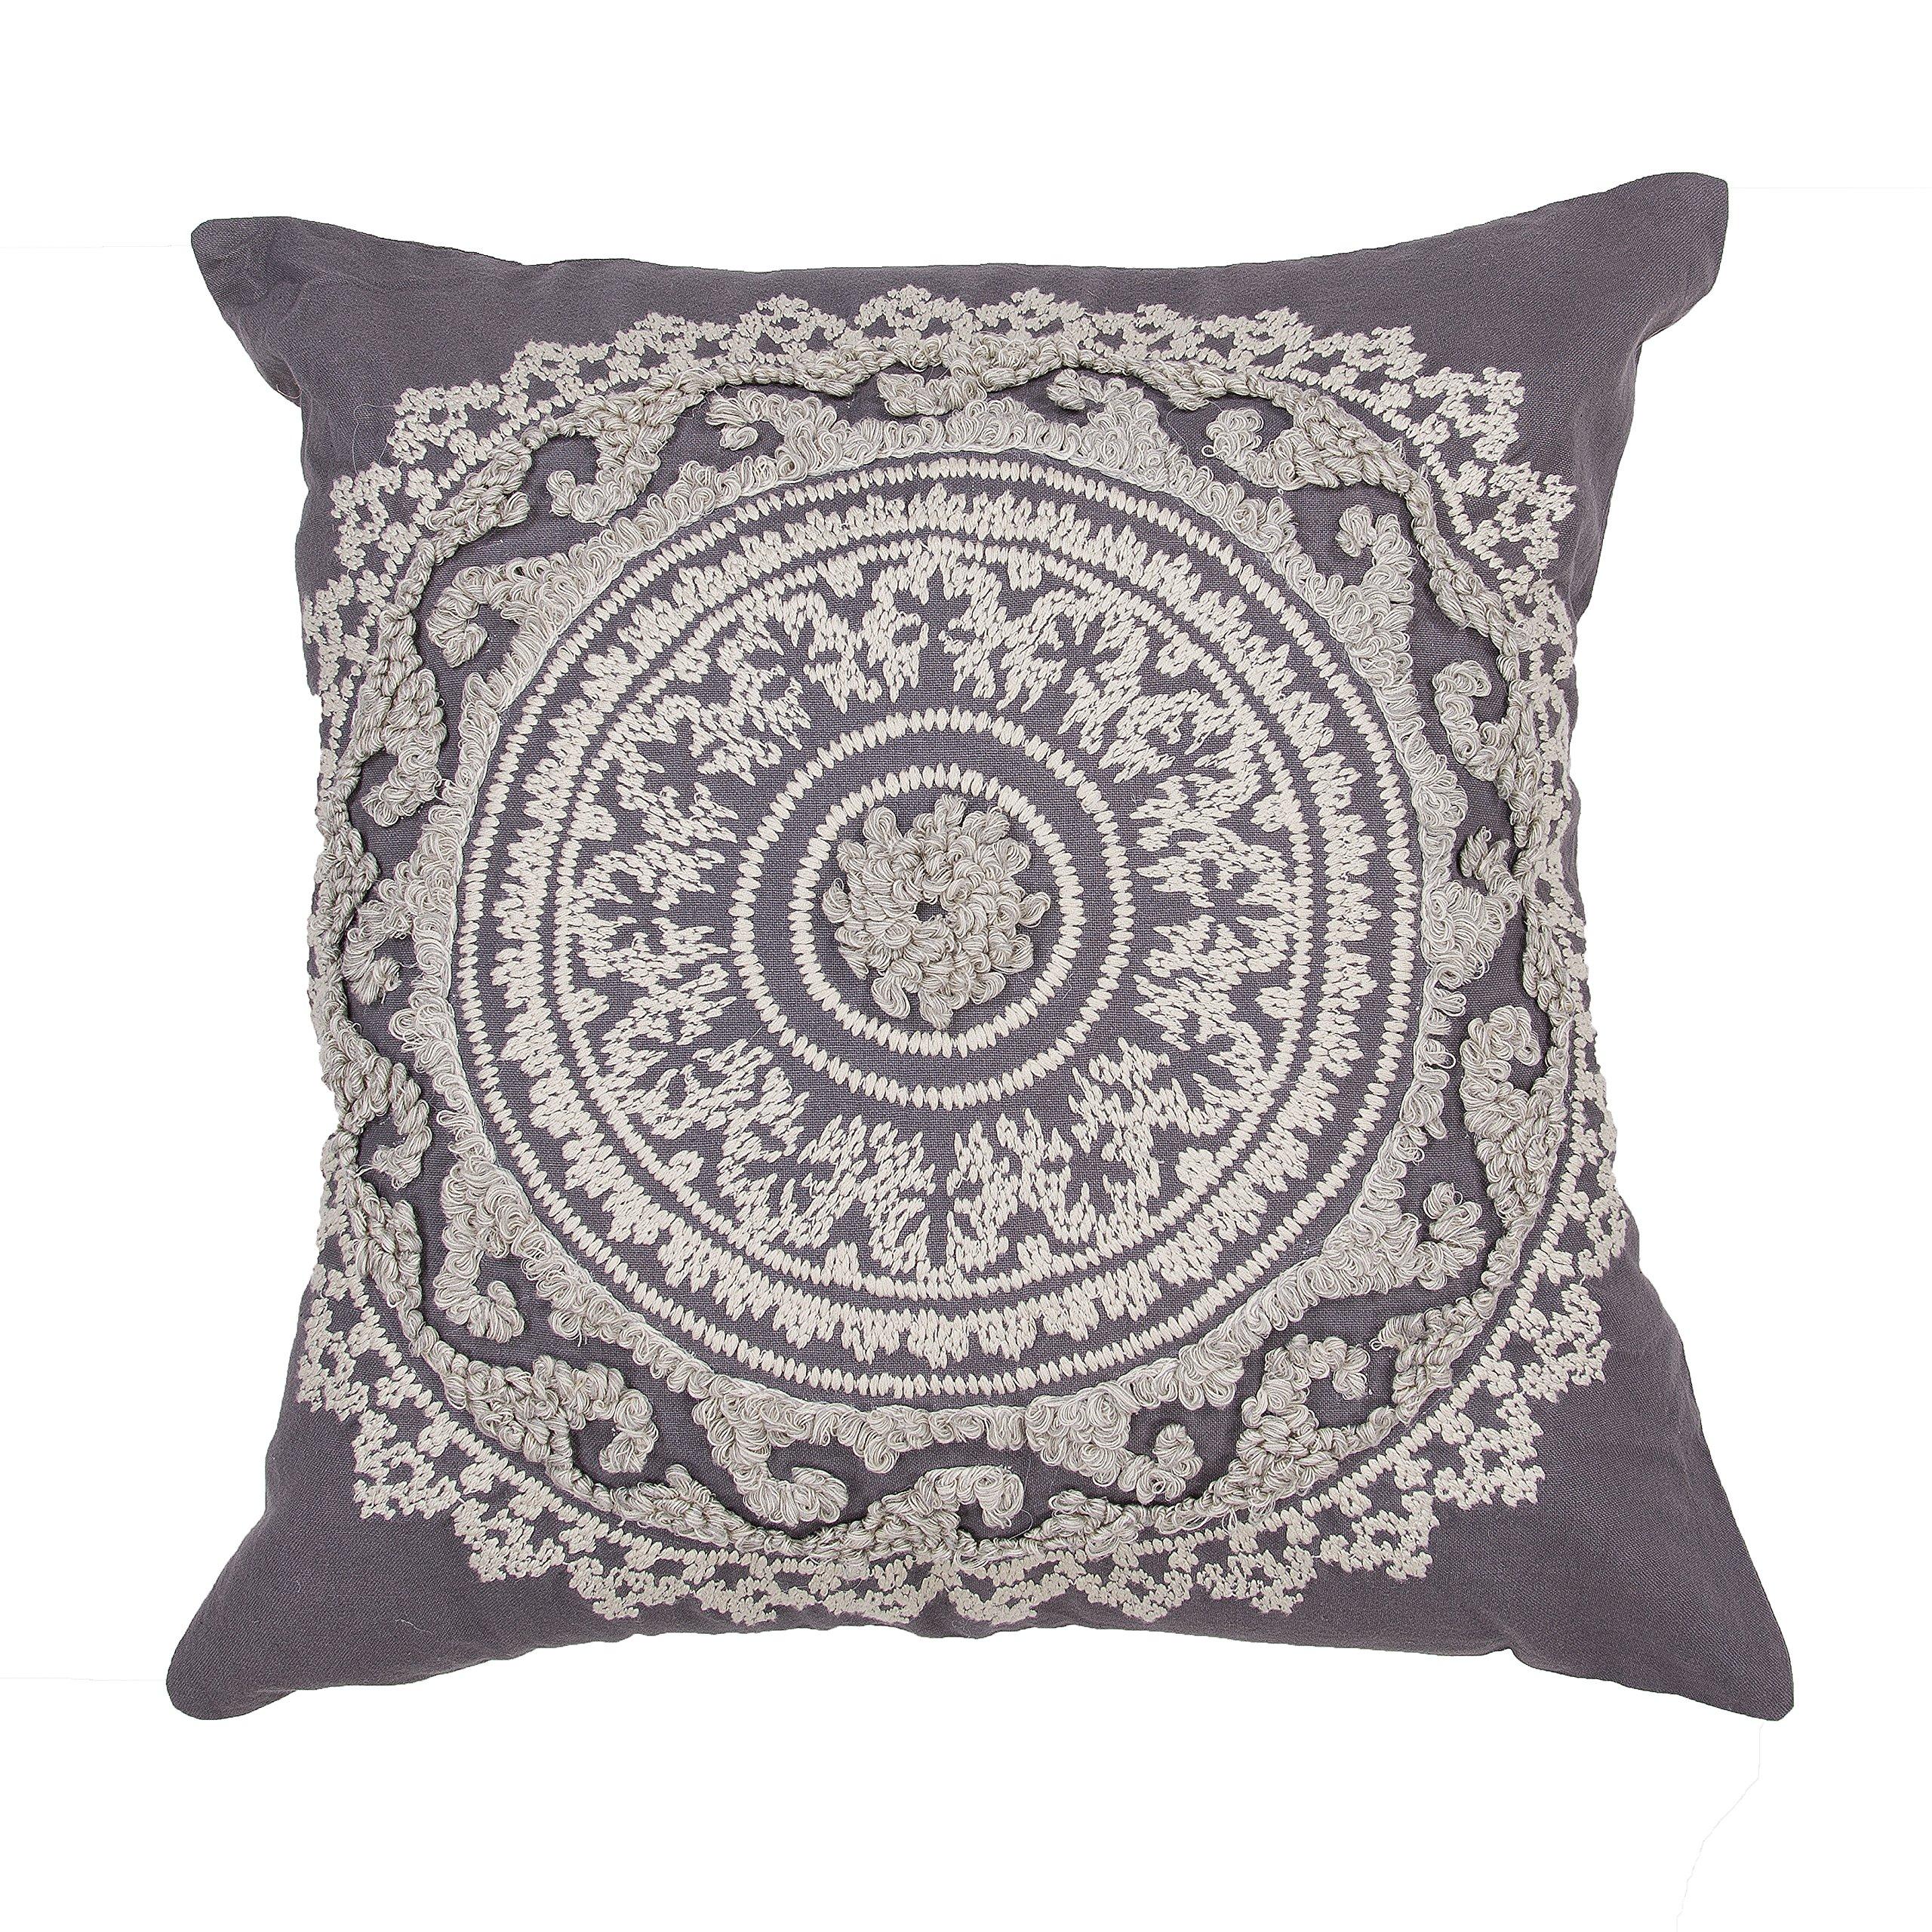 Jaipur Floral Pattern Dark Gray Cotton Polly Fill Pillow, 22-Inch x 22-Inch, Eiffel Tower Jen07